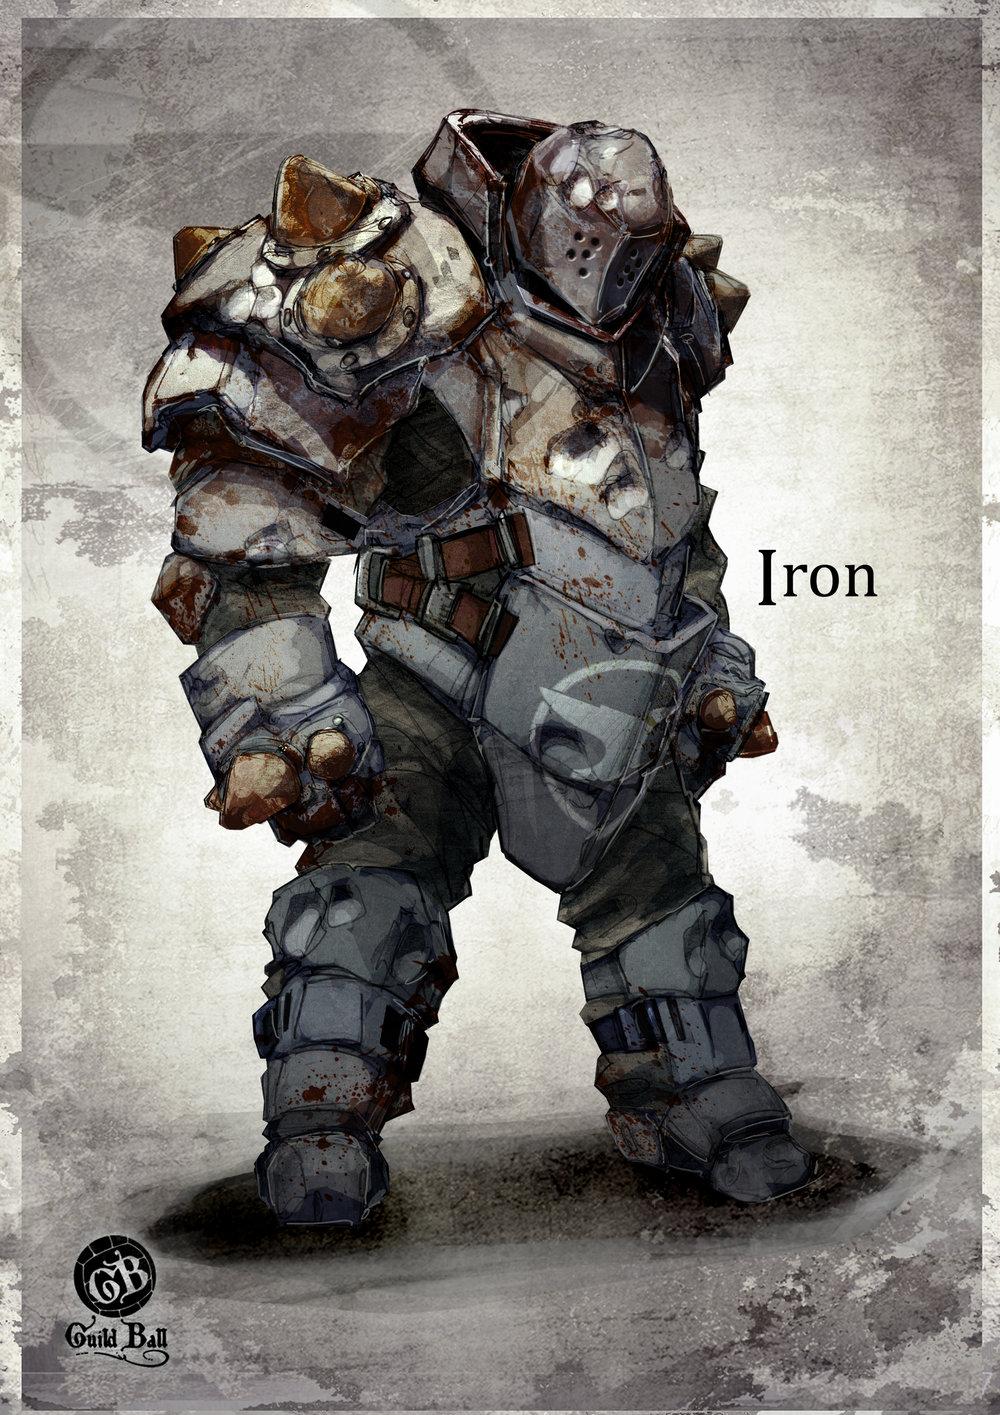 iron01.jpg